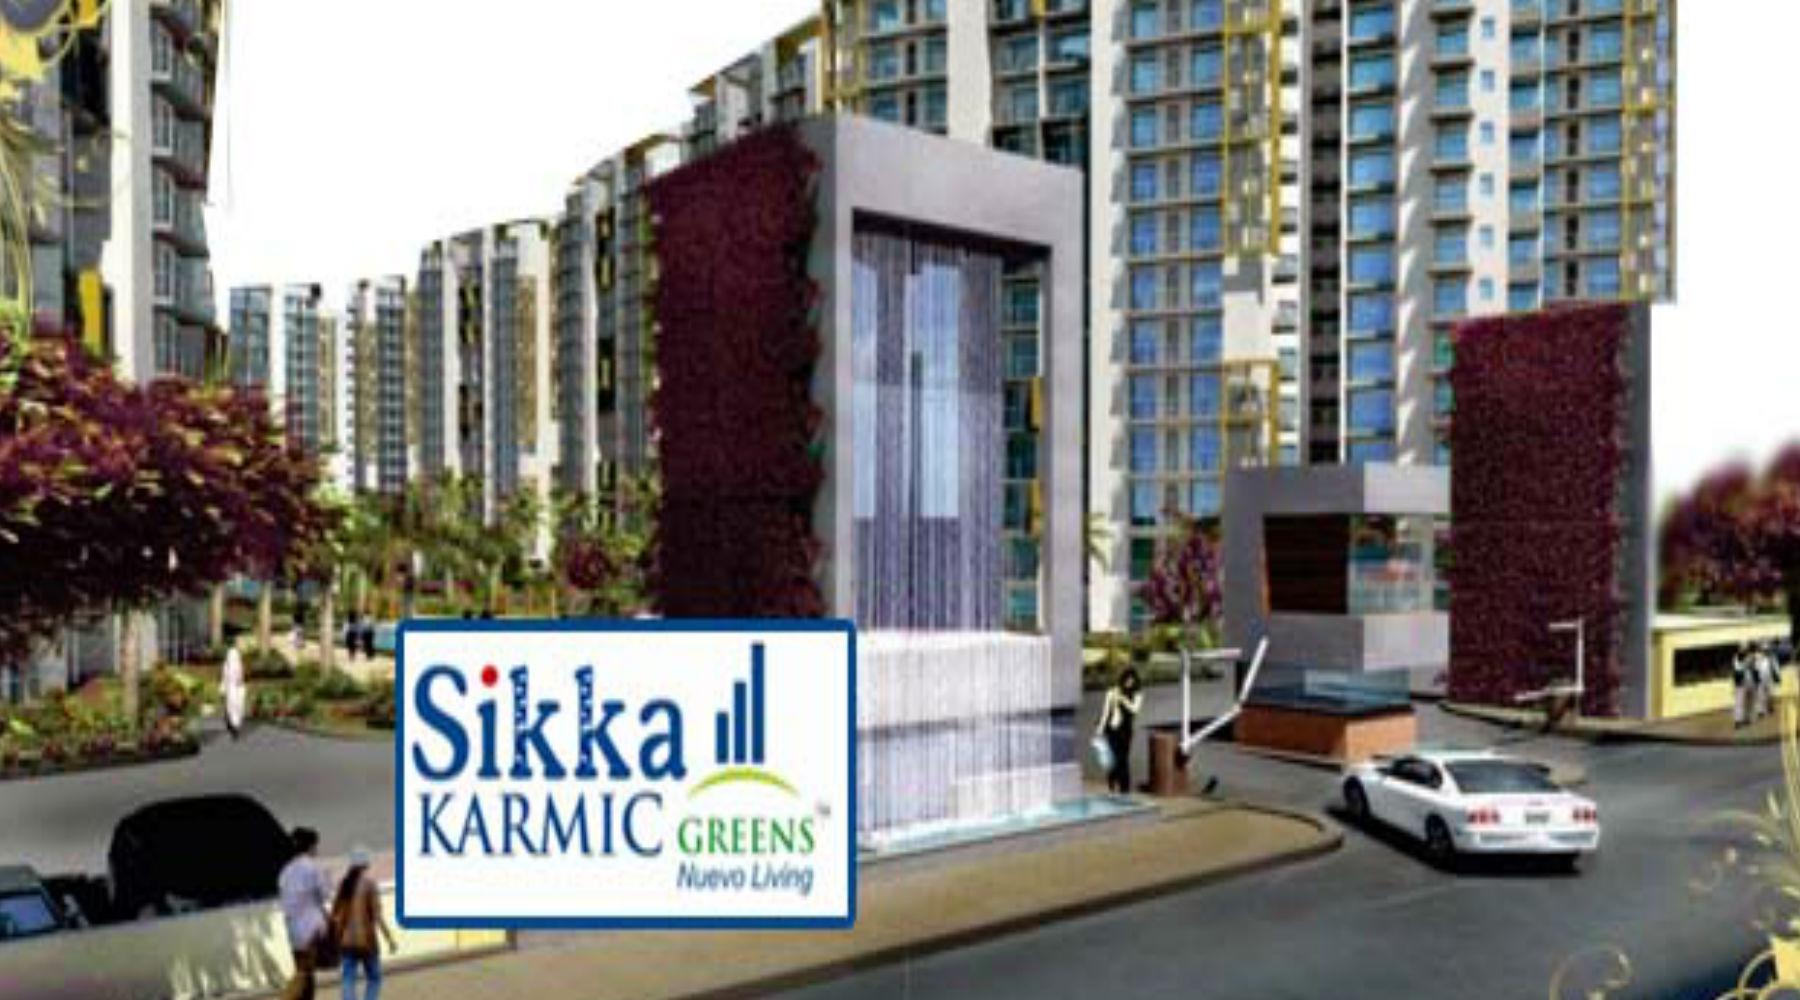 sikka-karmic-greens-flats